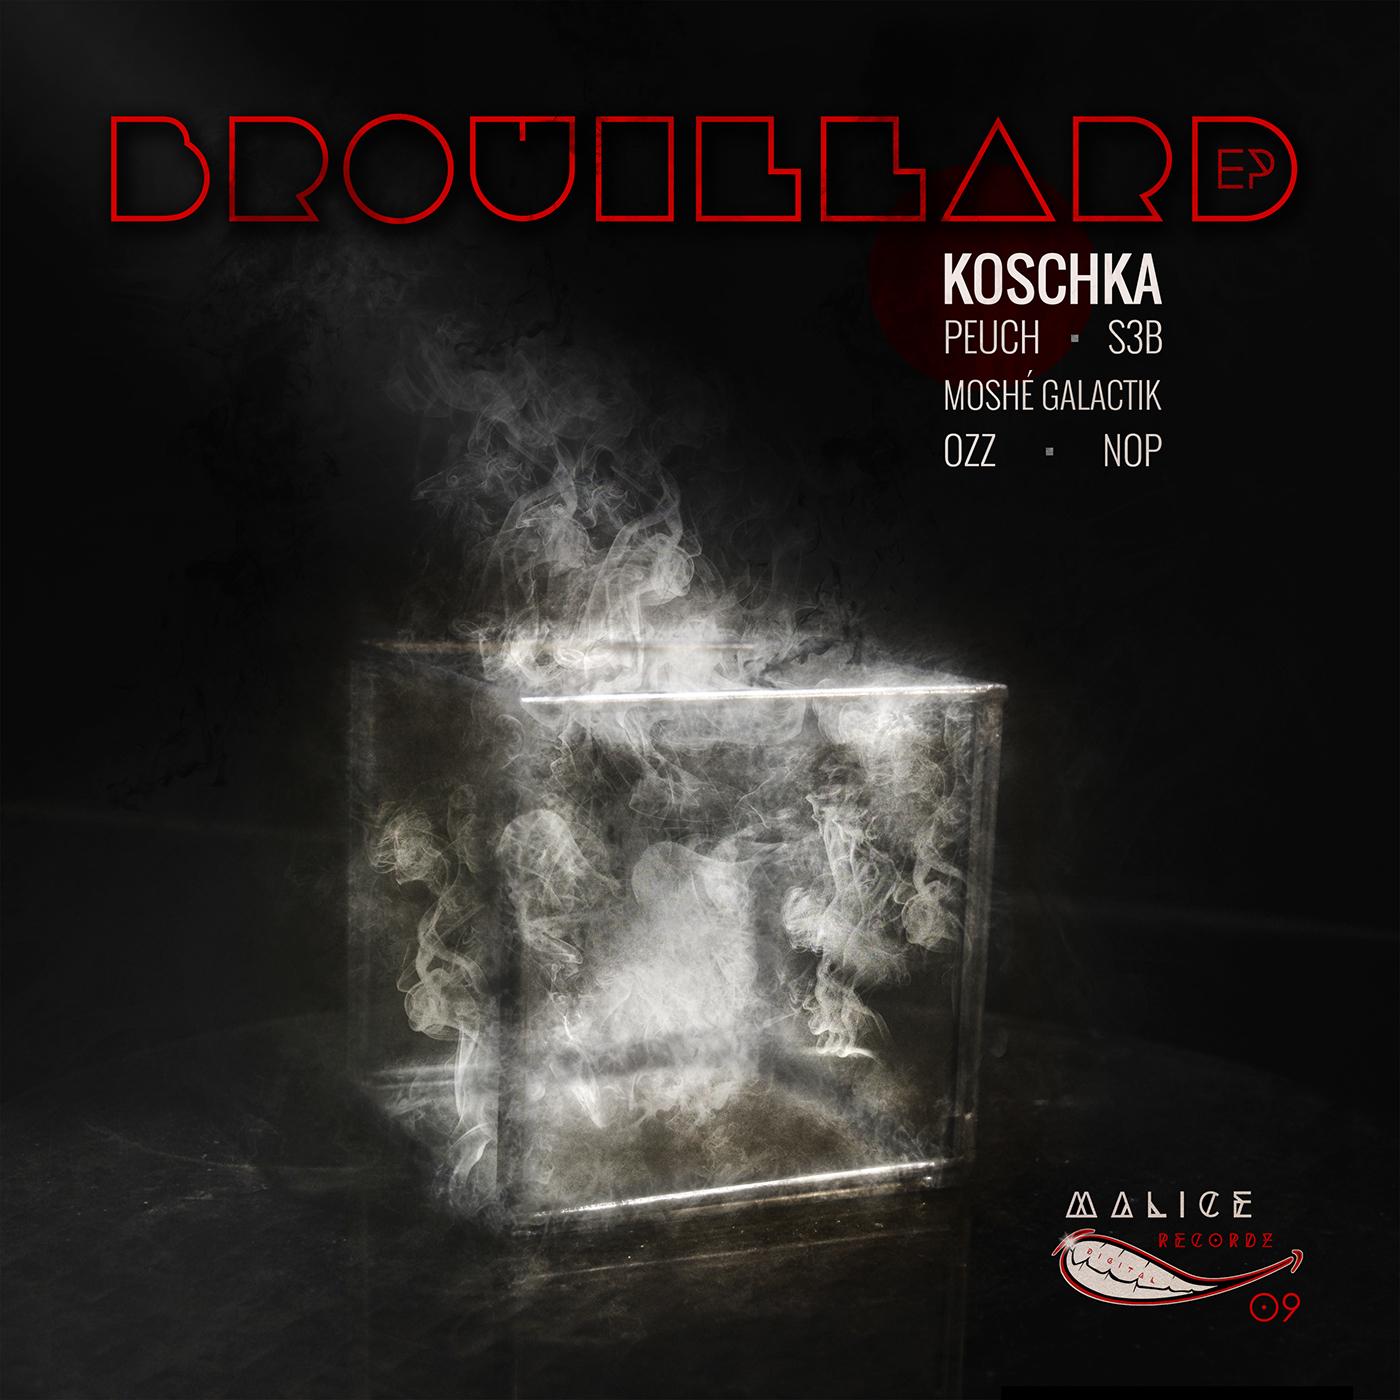 brouillard,techno,Koschka,ep,Musique,Records,weblody,photo,fumée,boite